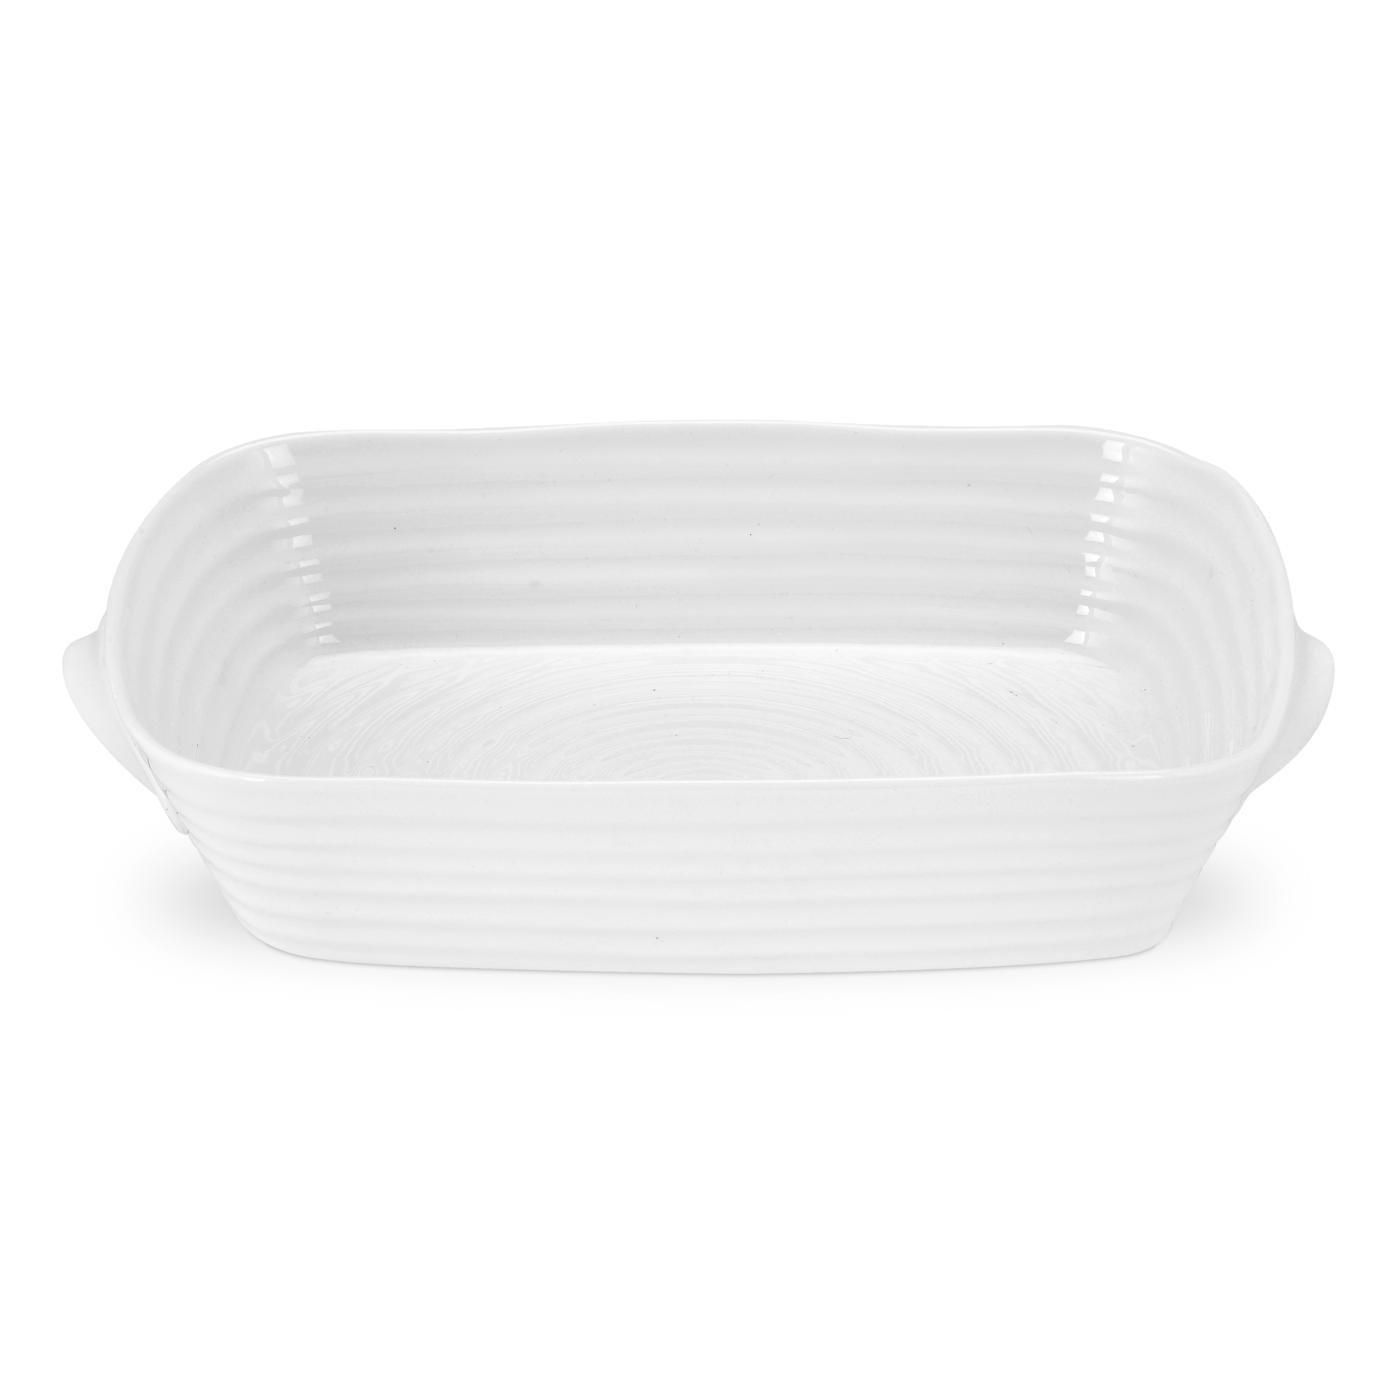 Portmeirion Sophie Conran White Medium Handled Rectangular Roasting Dish Portmeirion USA 543805